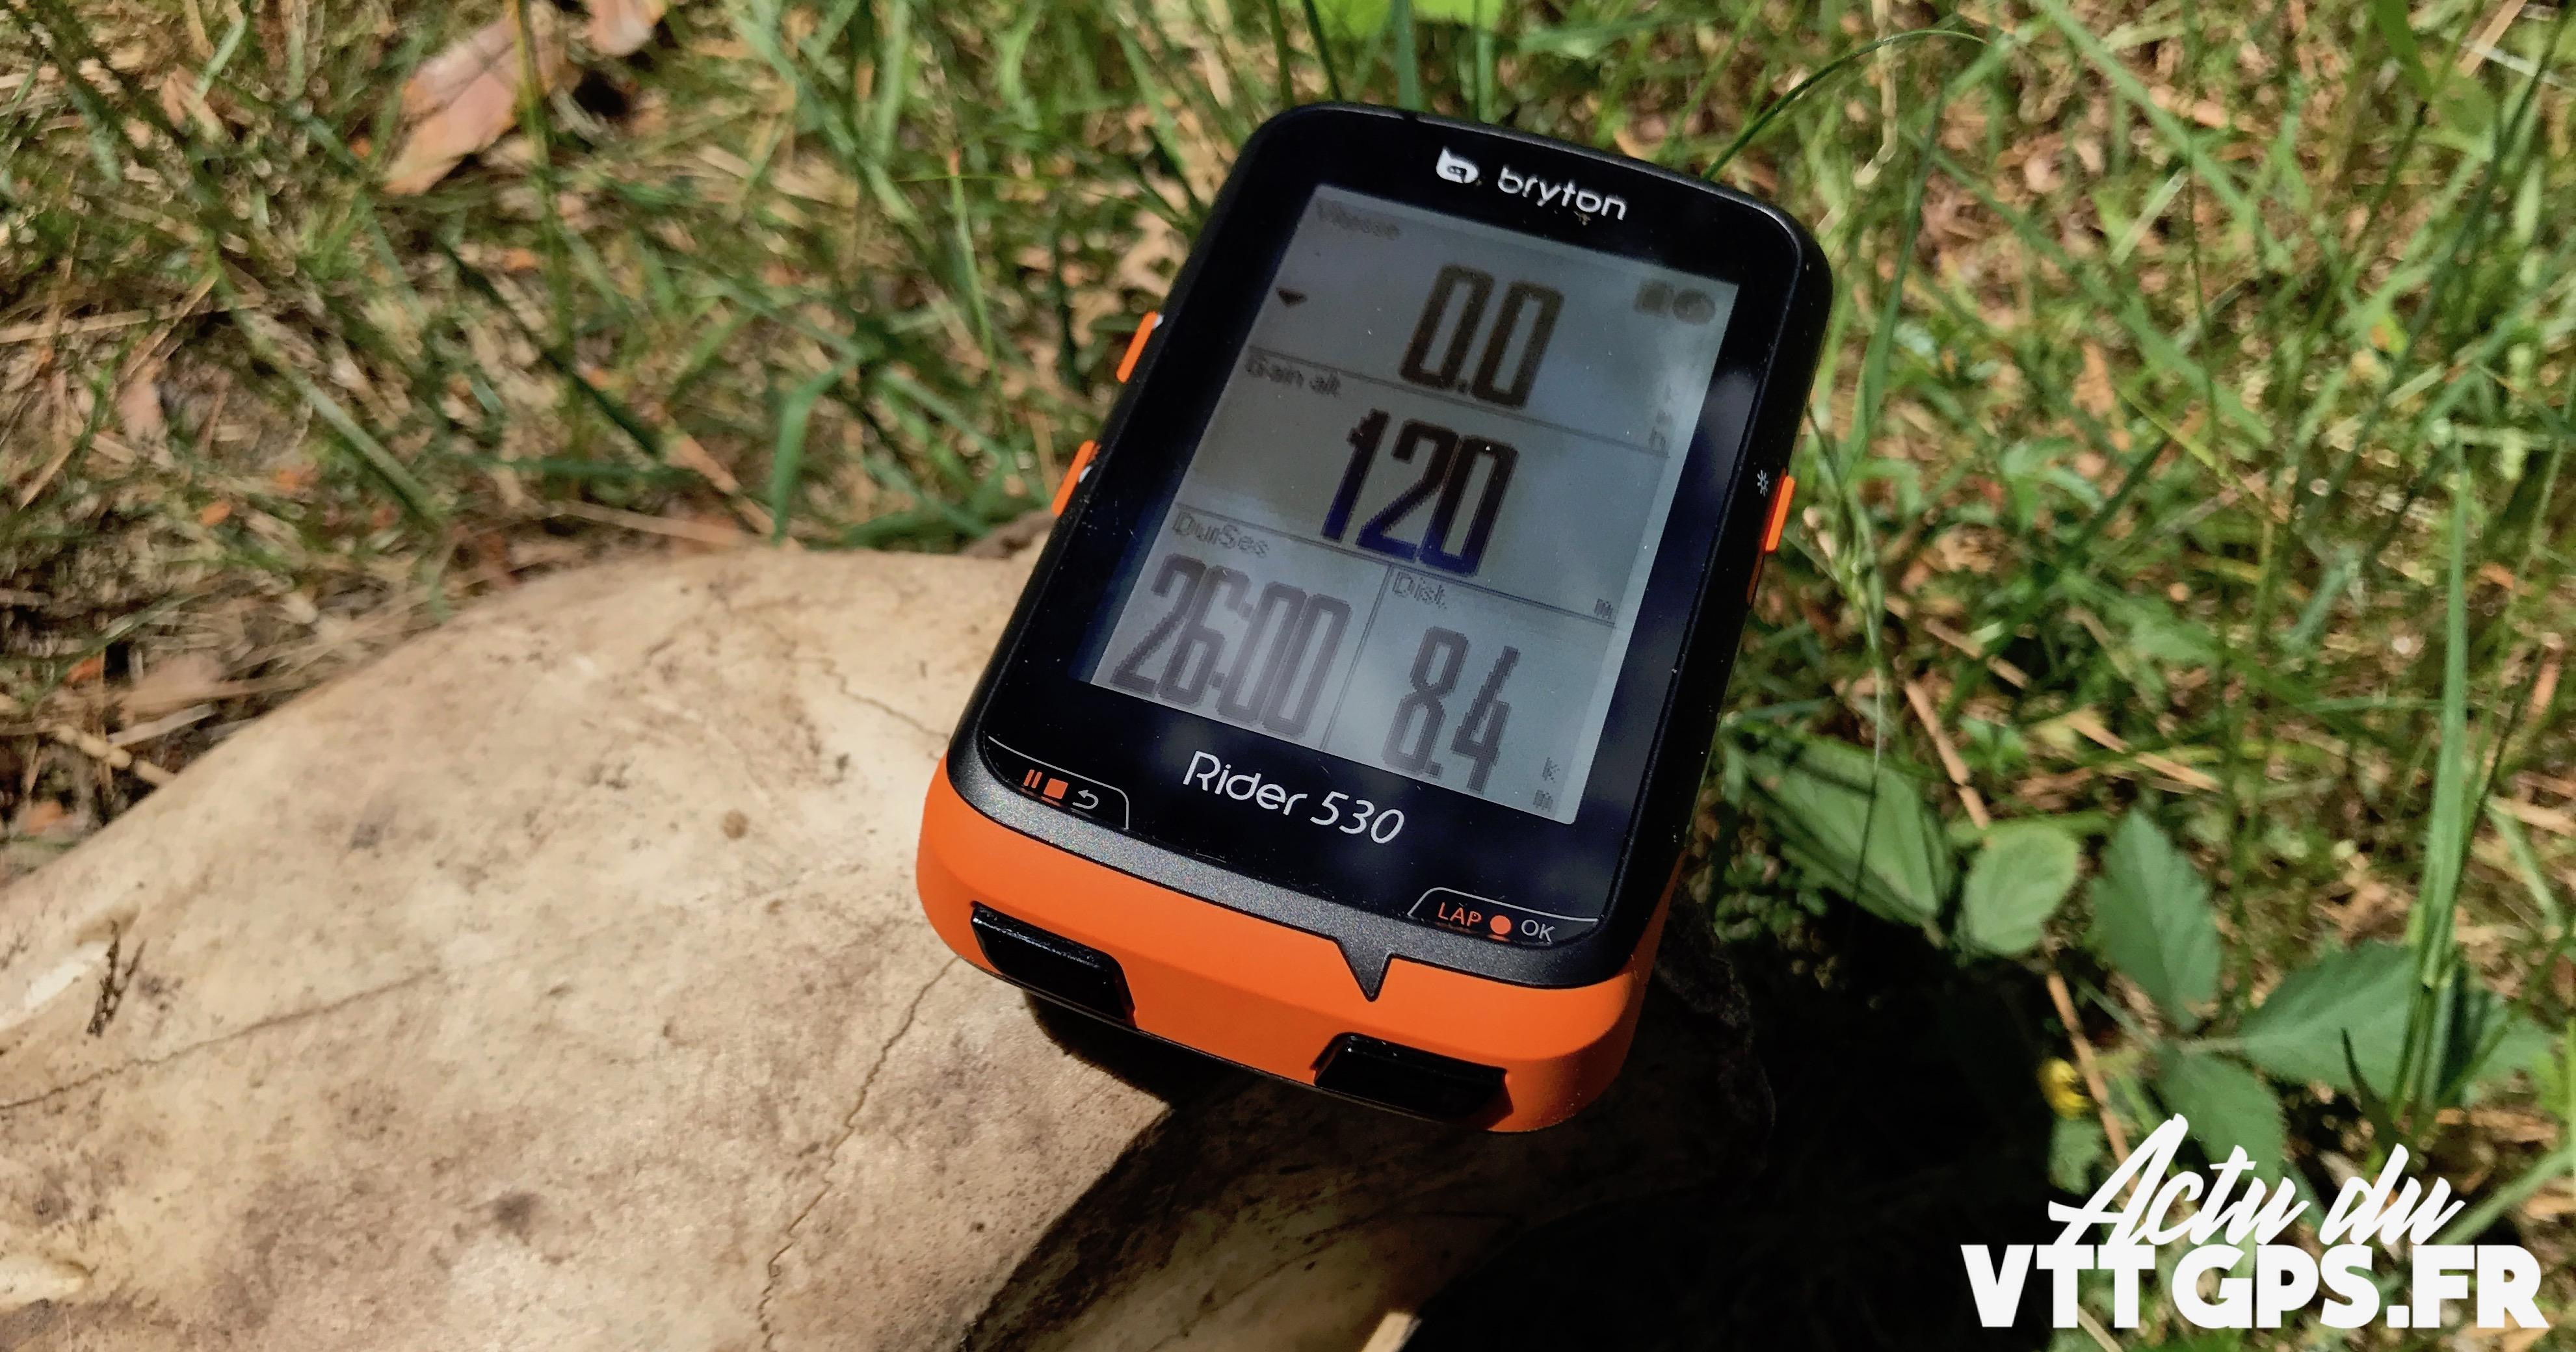 TEST DU COMPTEUR GPS BRYTON RIDER 530